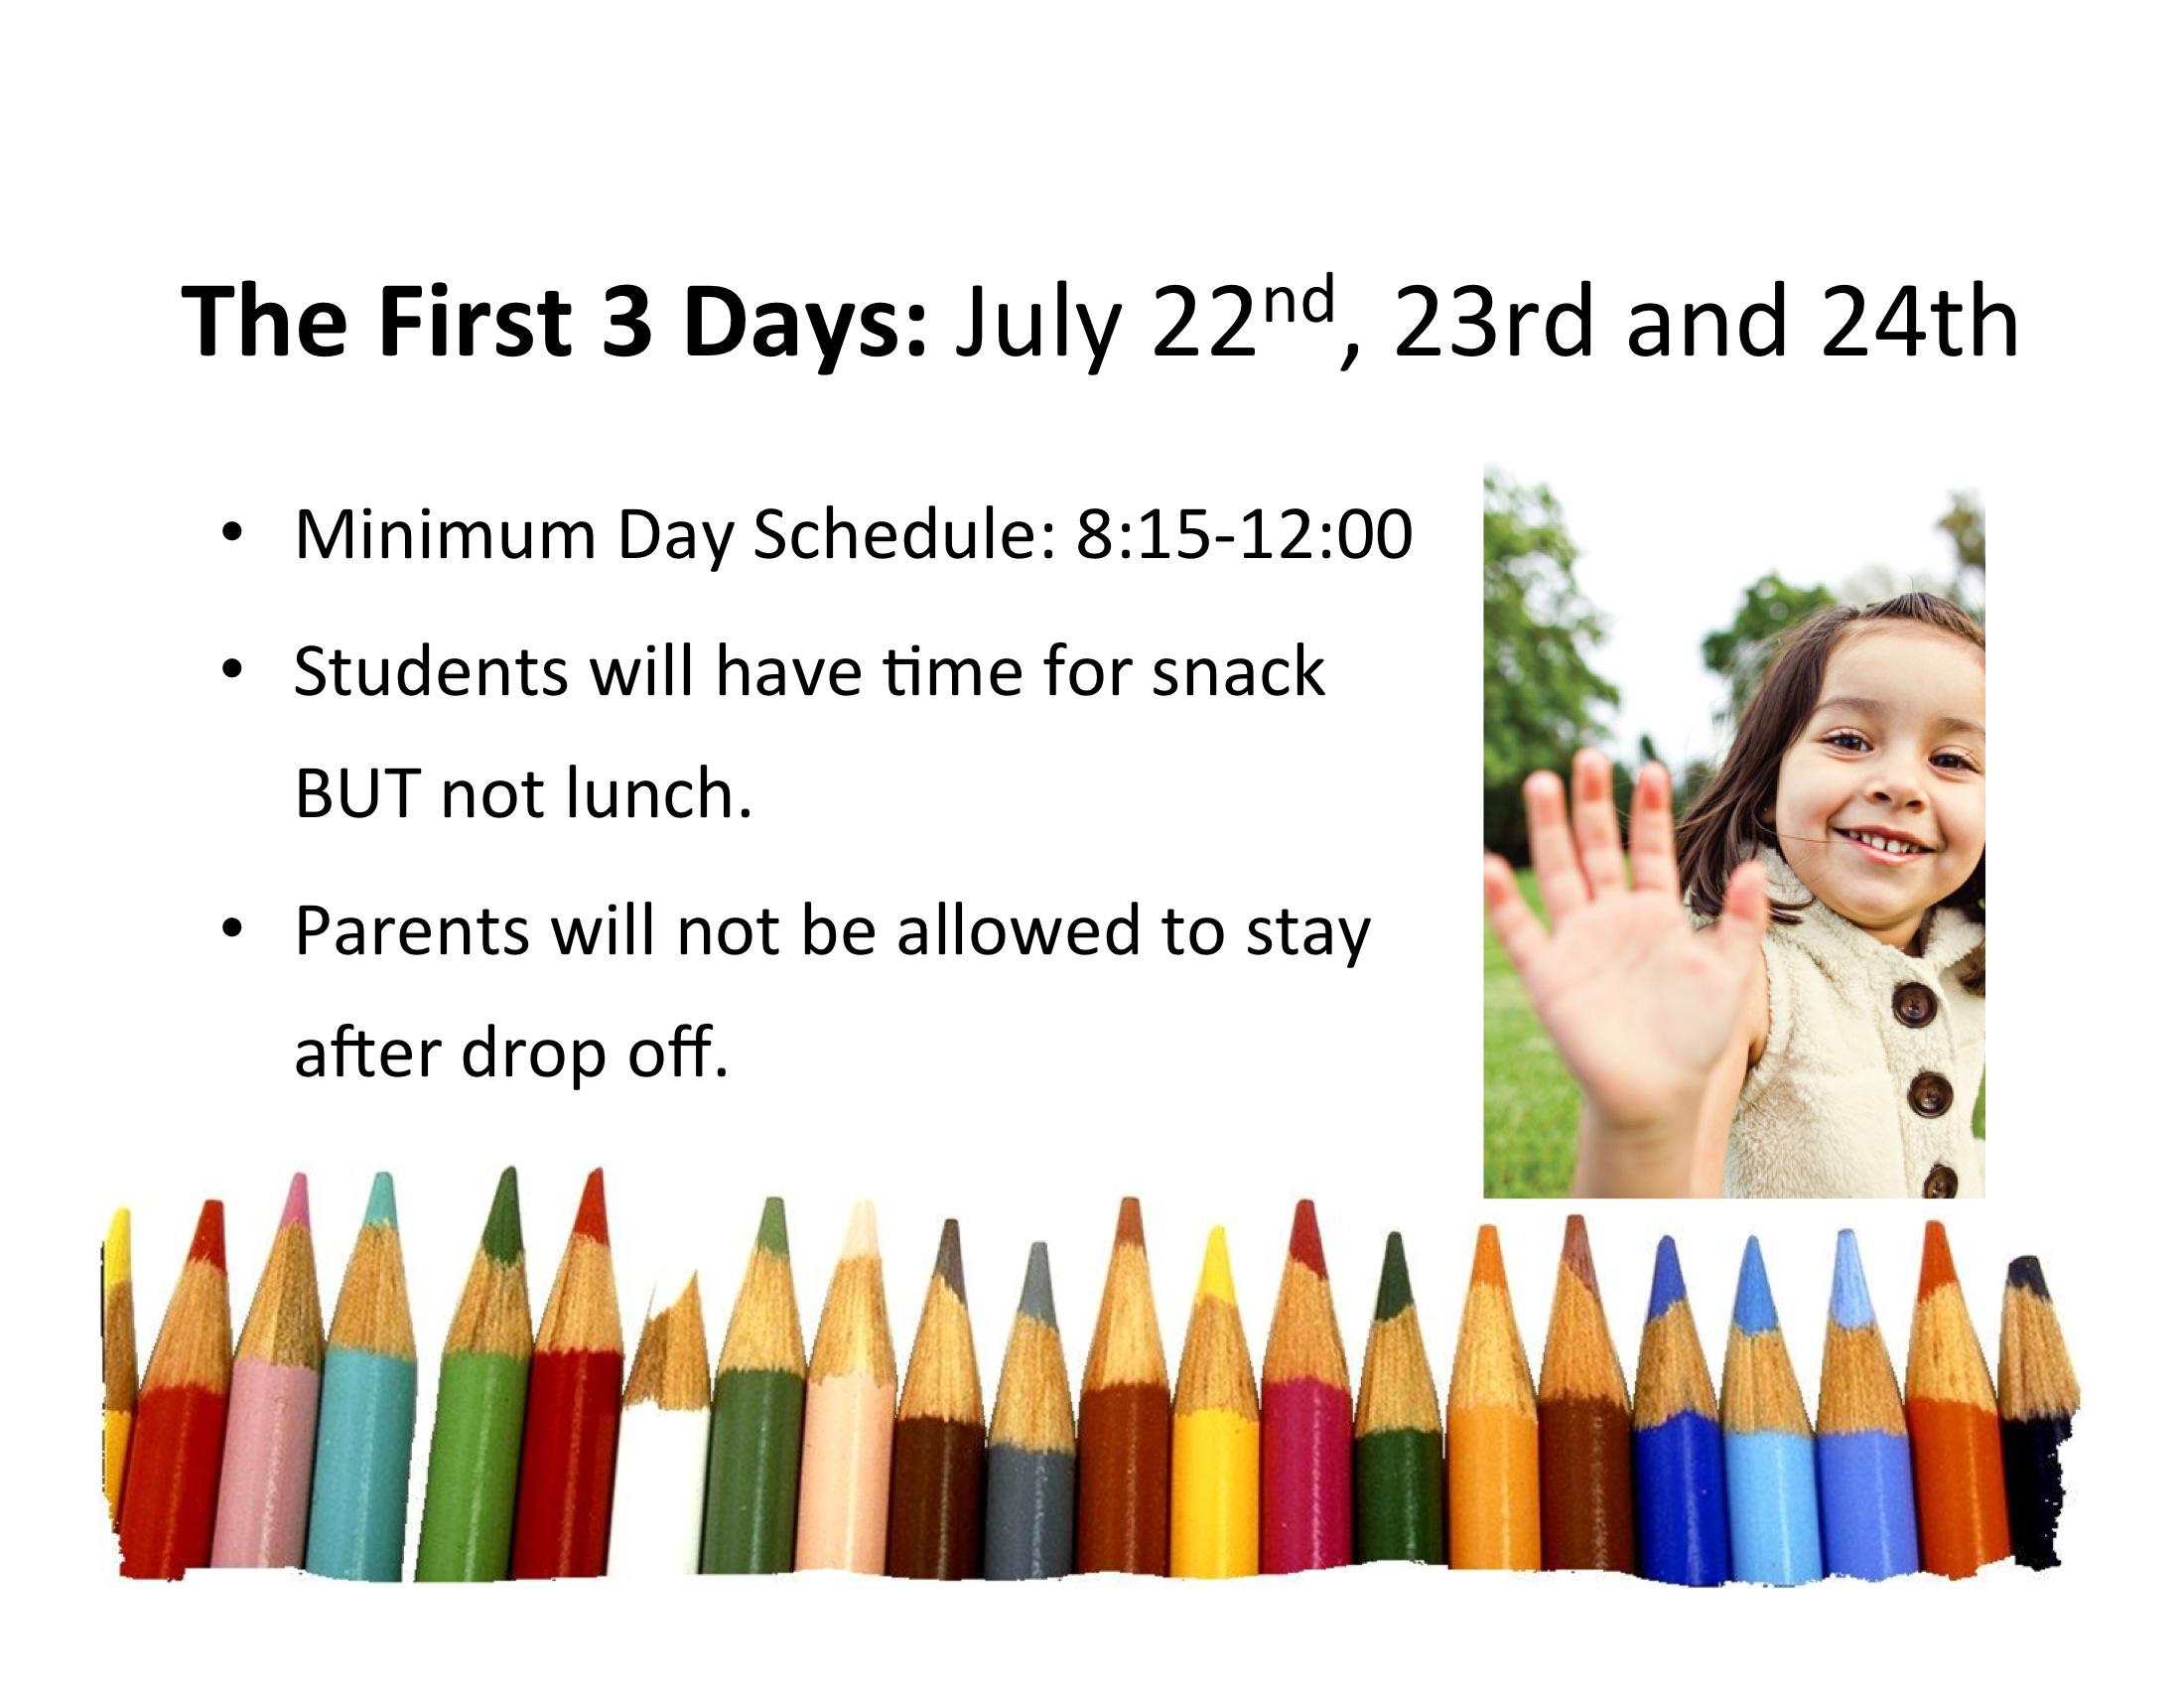 Kinder Orientation May 13 | Camarena Elementary School